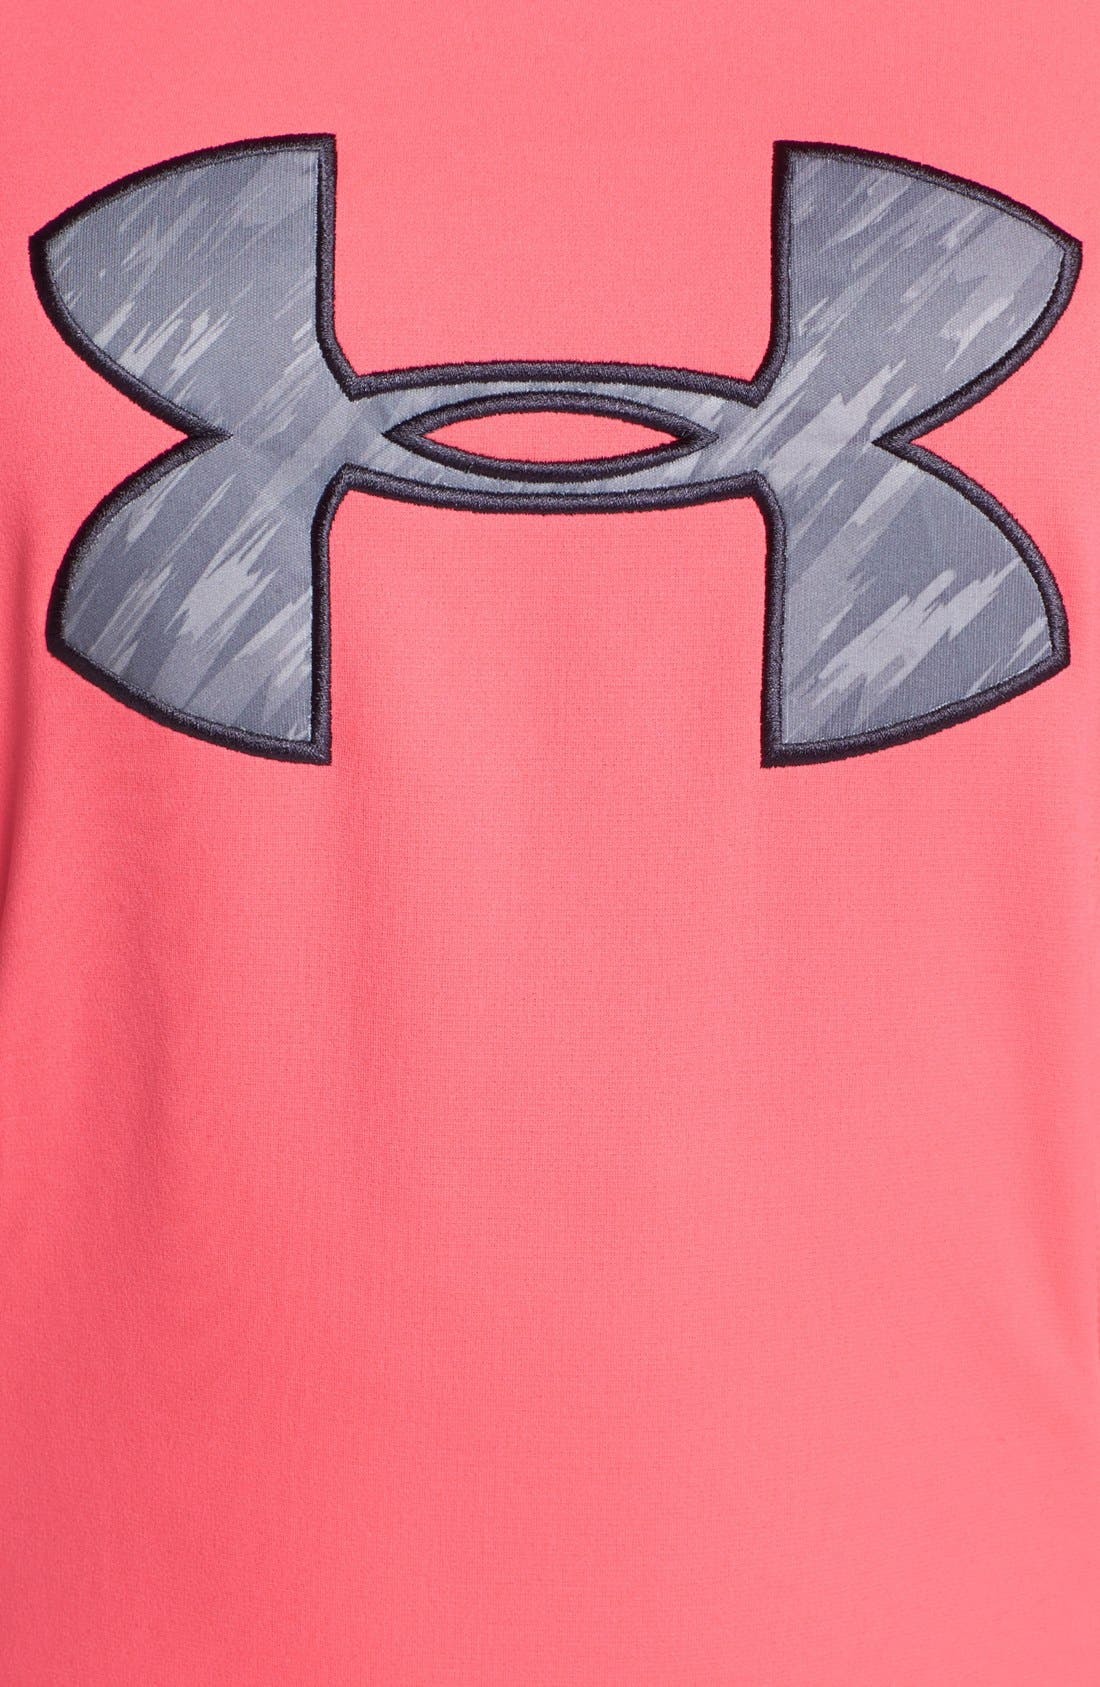 Alternate Image 3  - Under Armour 'Big Logo' Hoodie